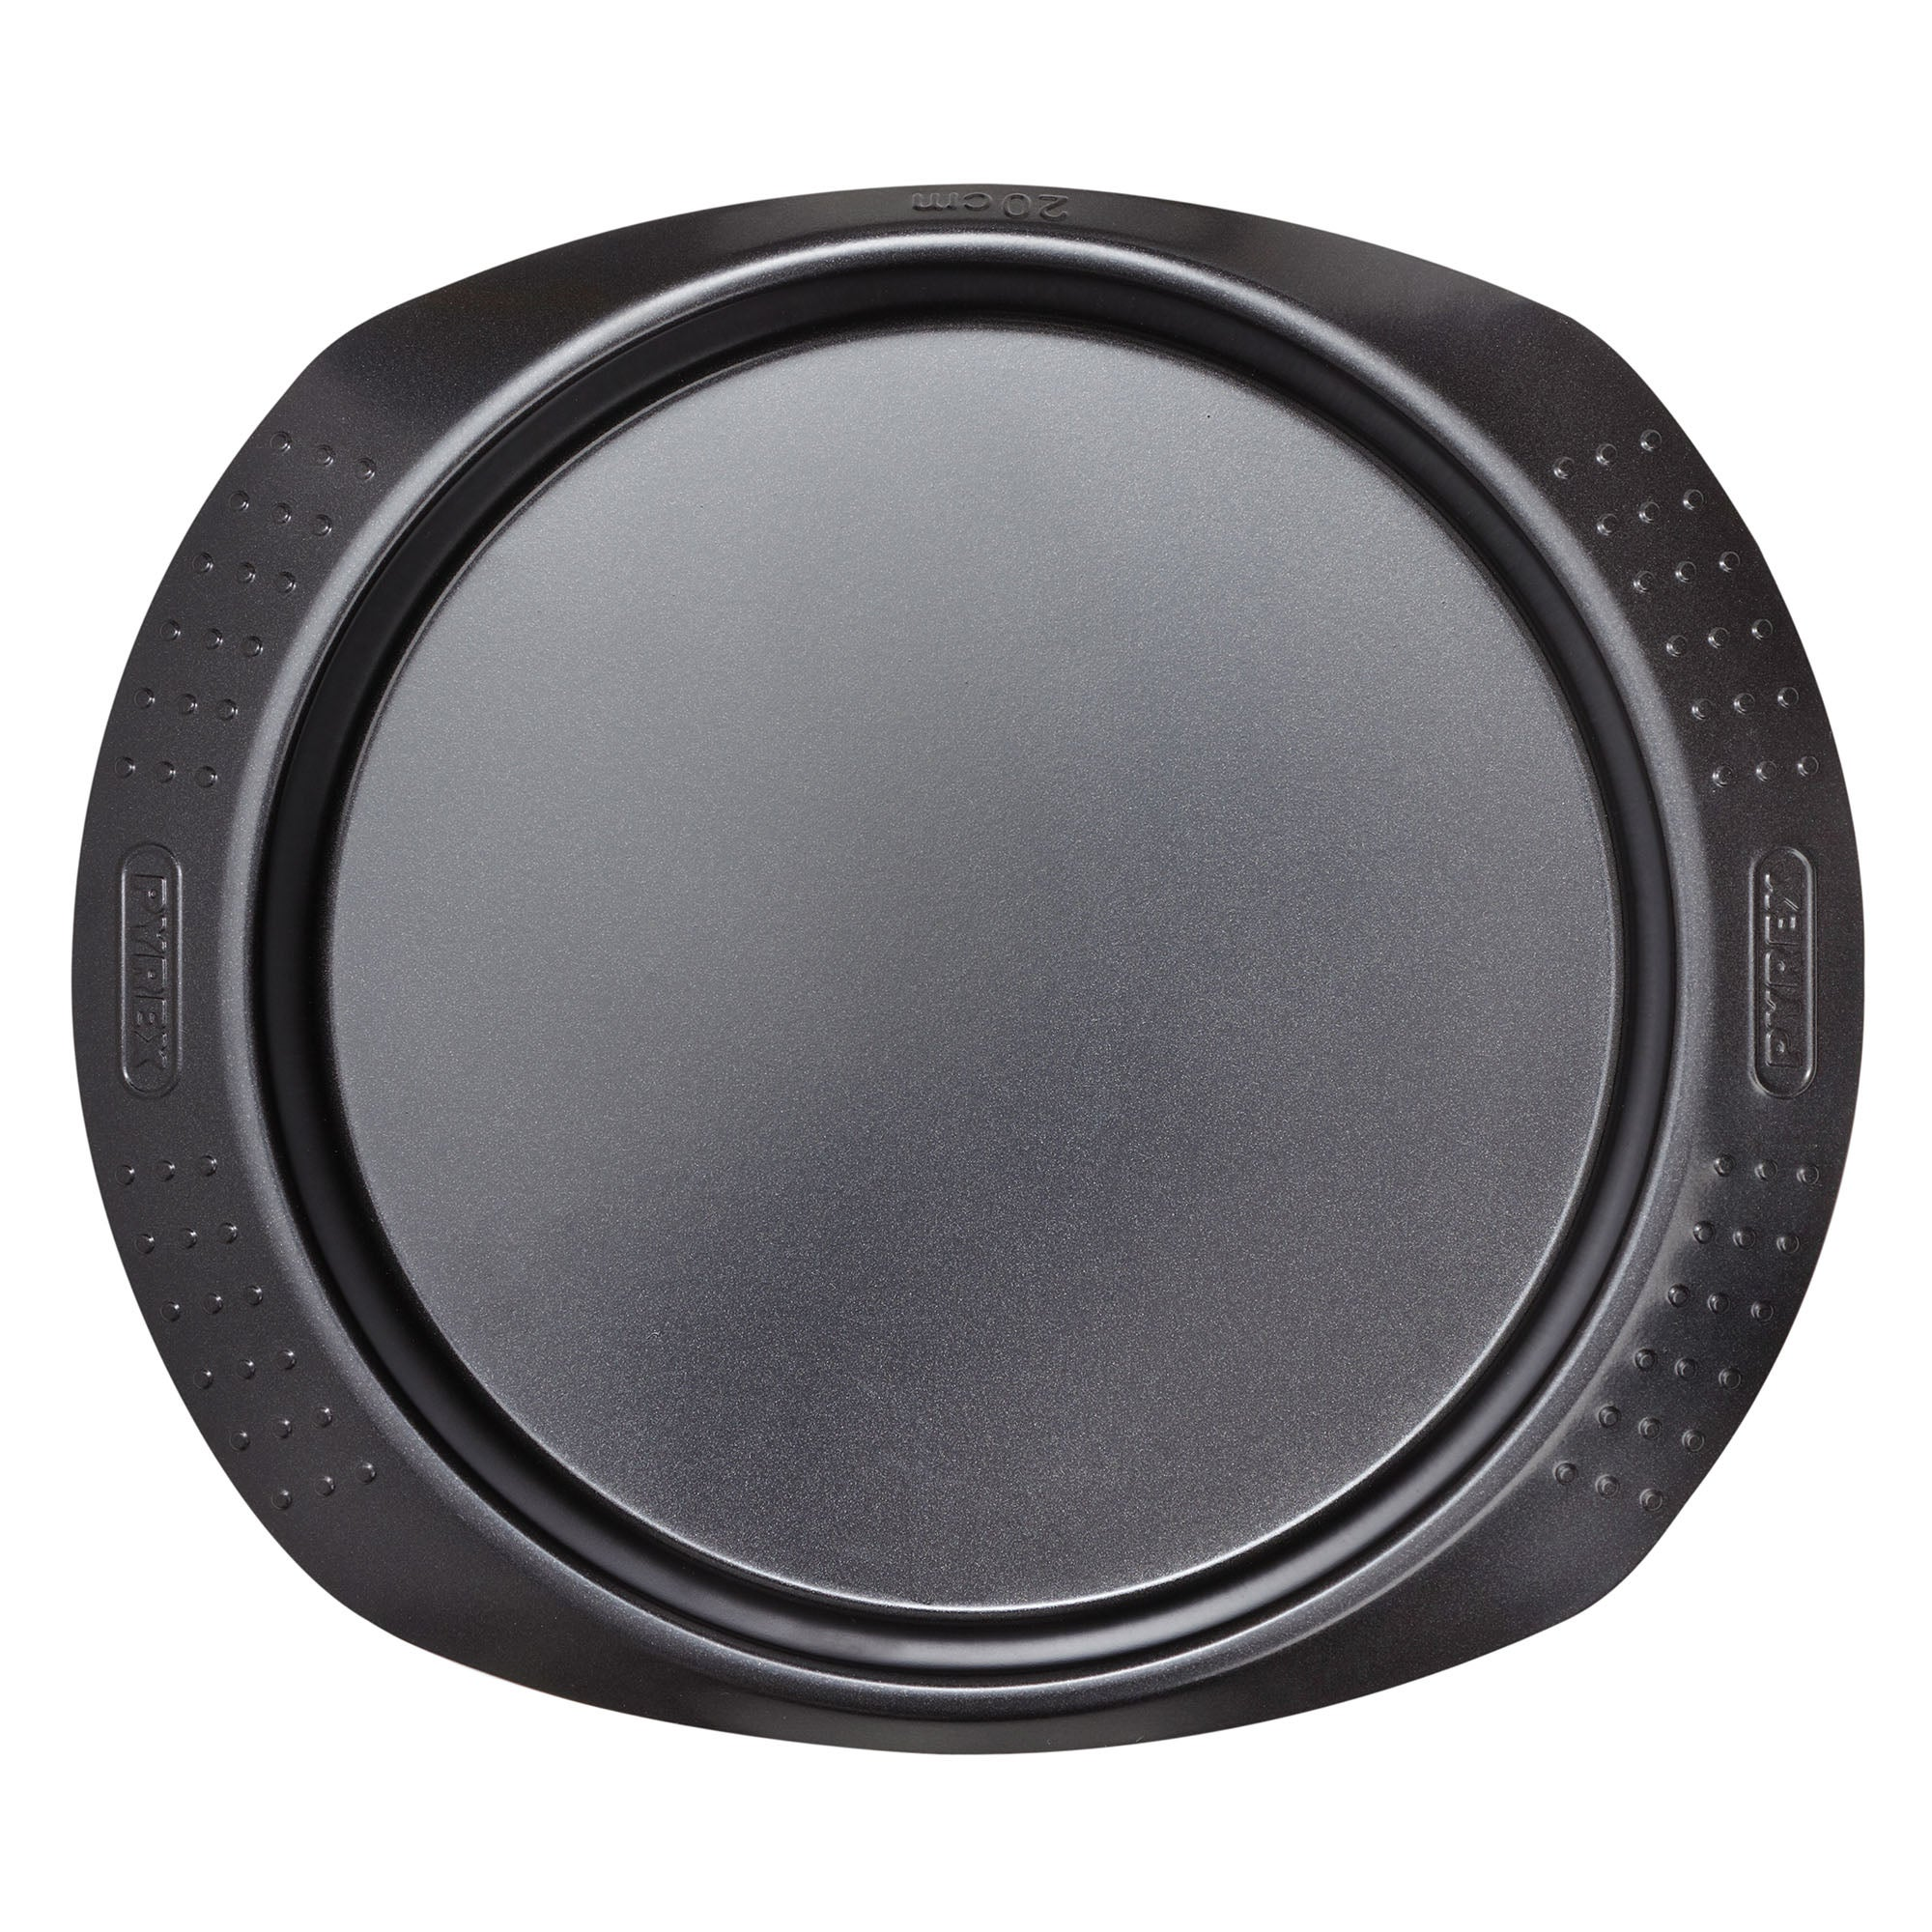 Pyrex Cake Pan